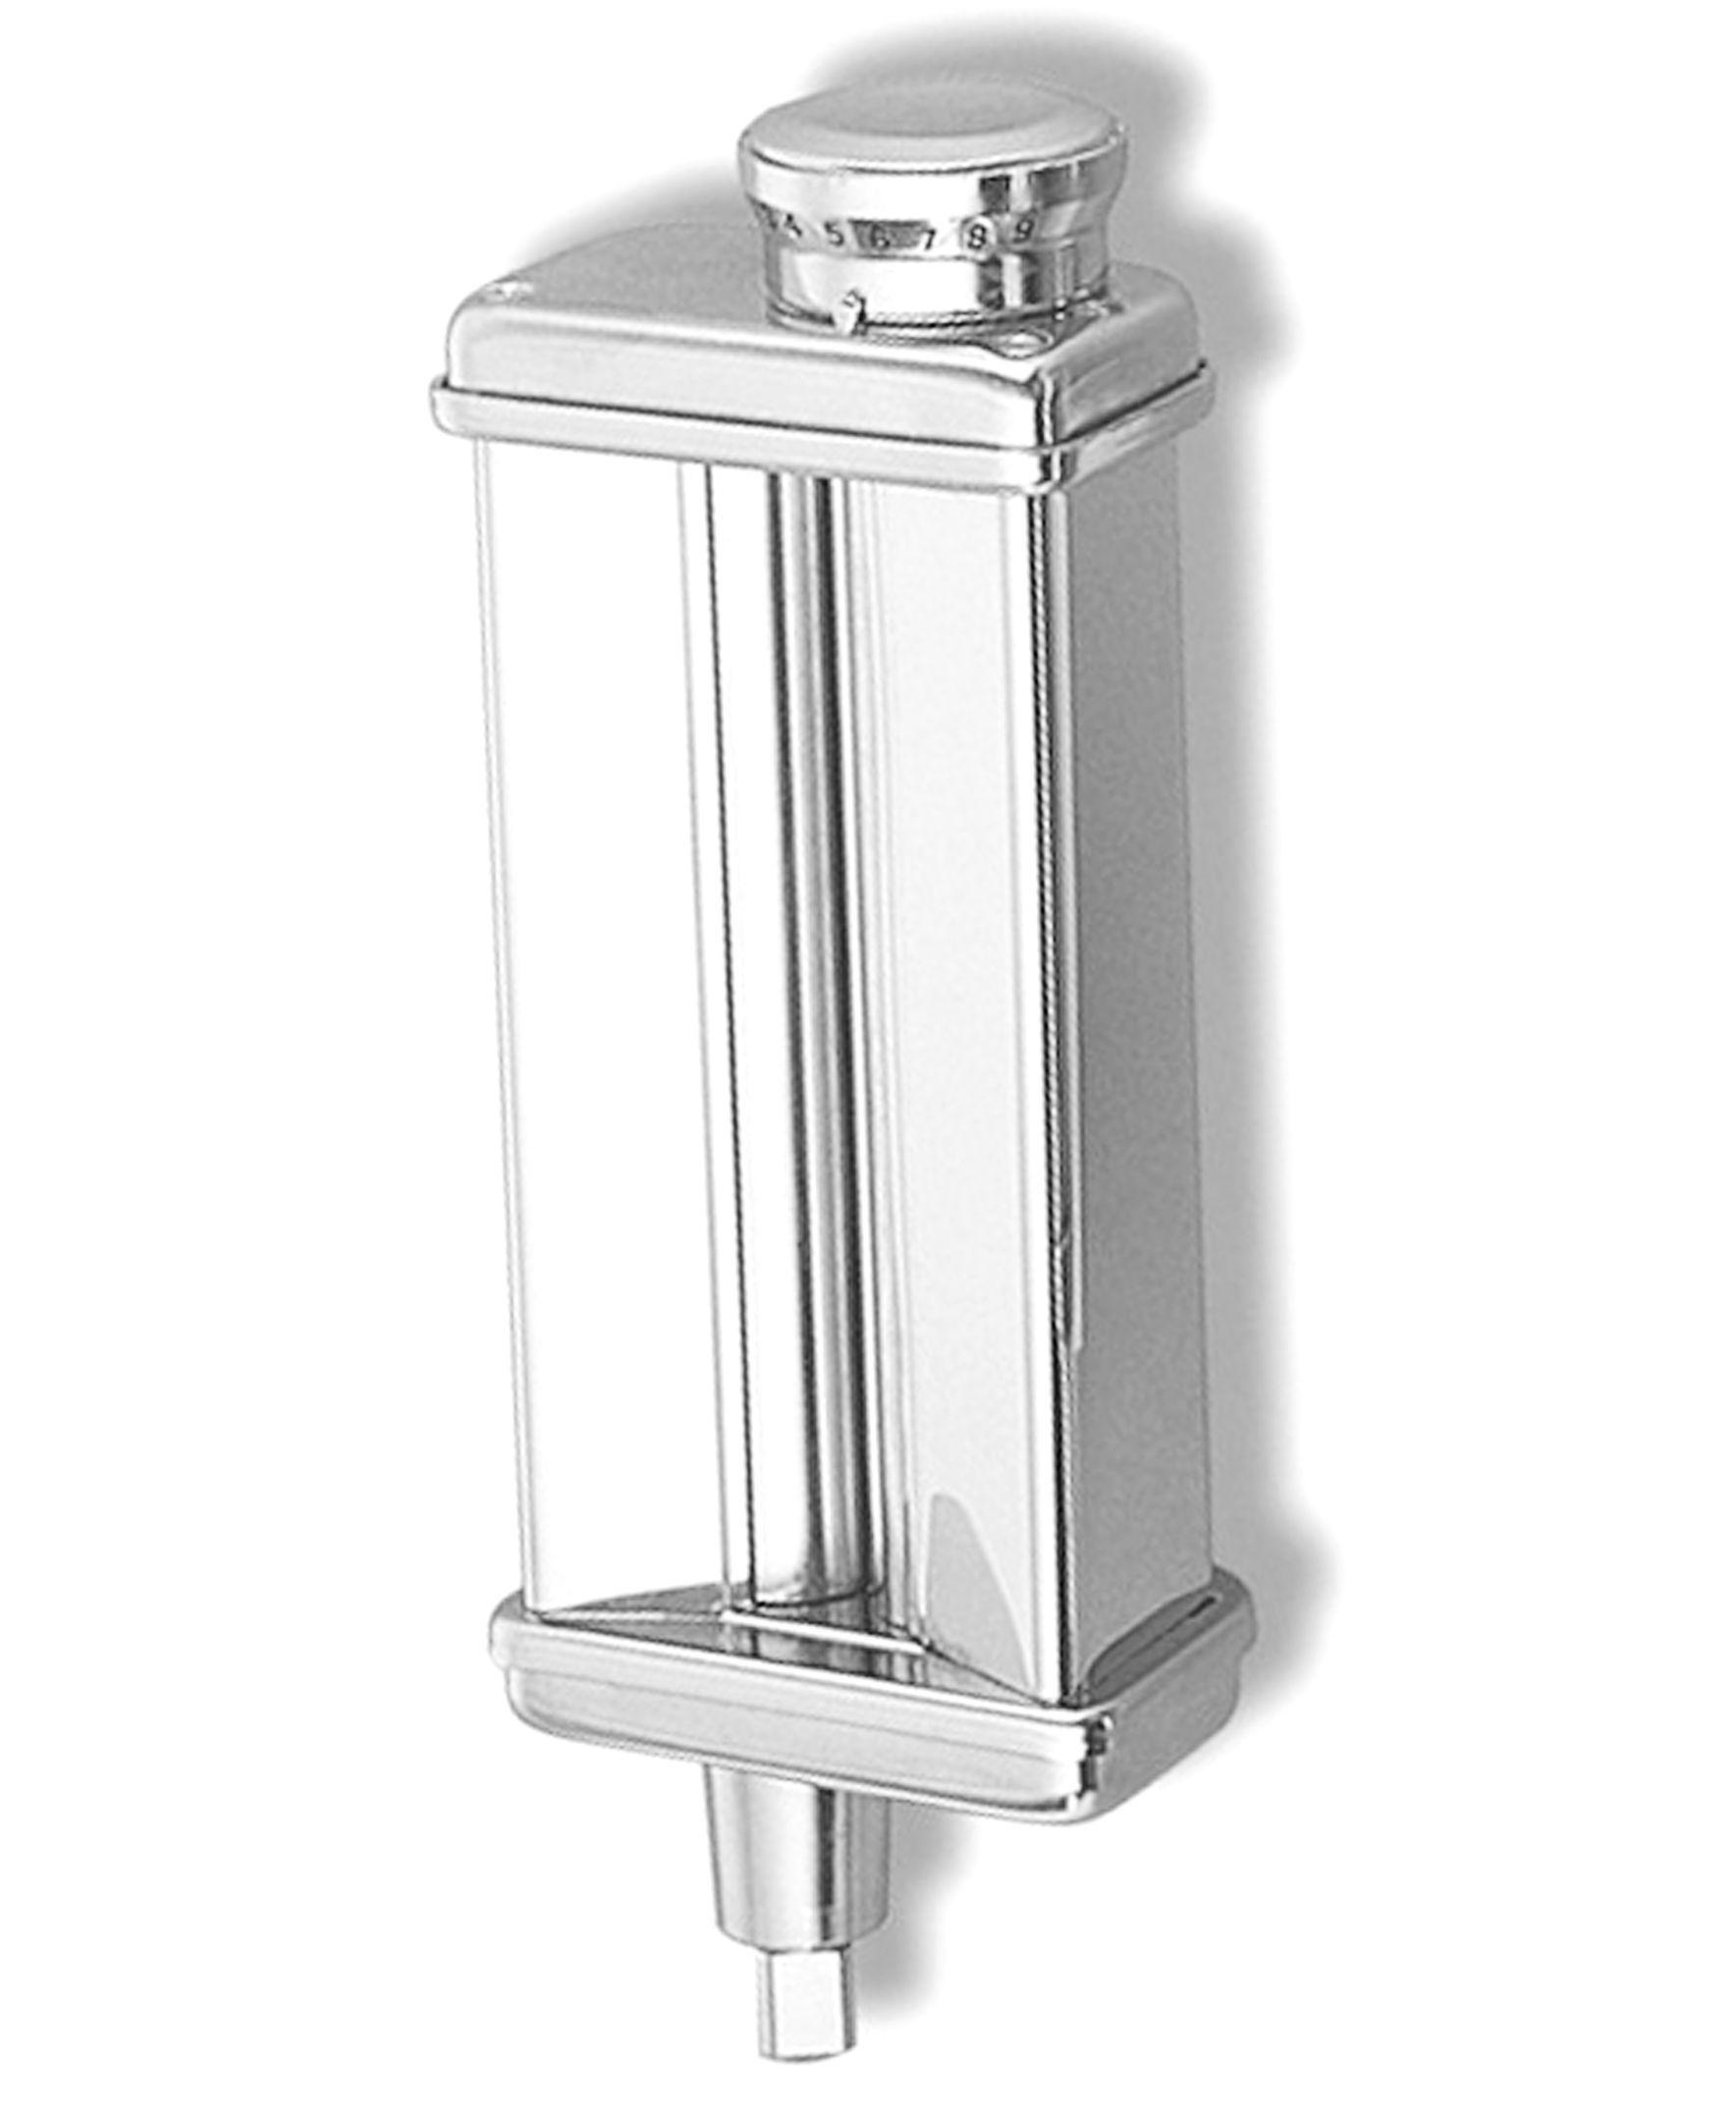 KitchenAid Kpsa Pasta Roller Stand Mixer Attachment   Products ...